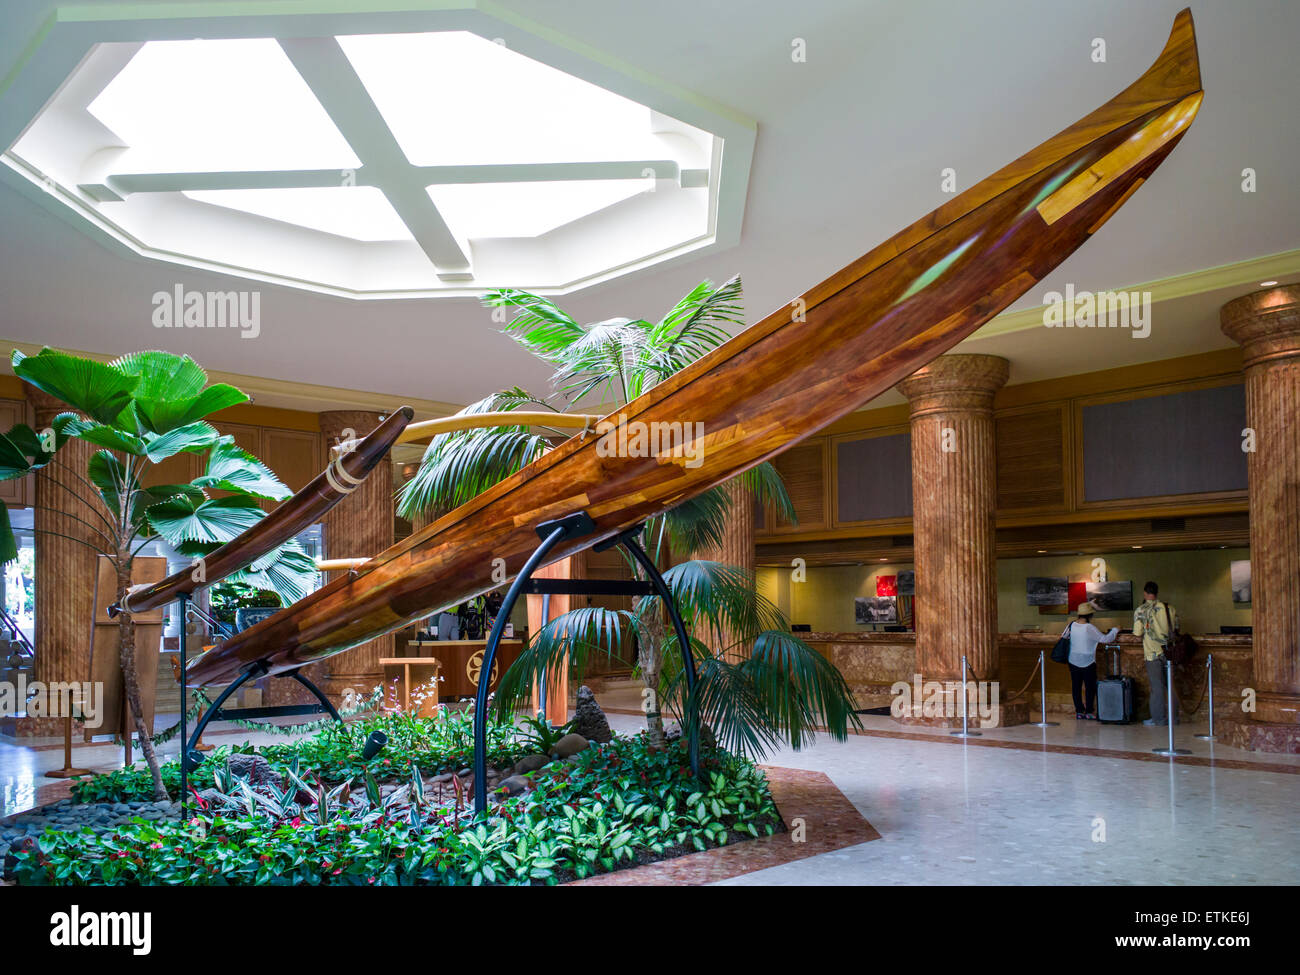 The antique 'Princess: Koa outrigger canoe, Kaua'i Marriott Resort; Kalapaki Bay, Kaua'i, Hawaii, USA - Stock Image